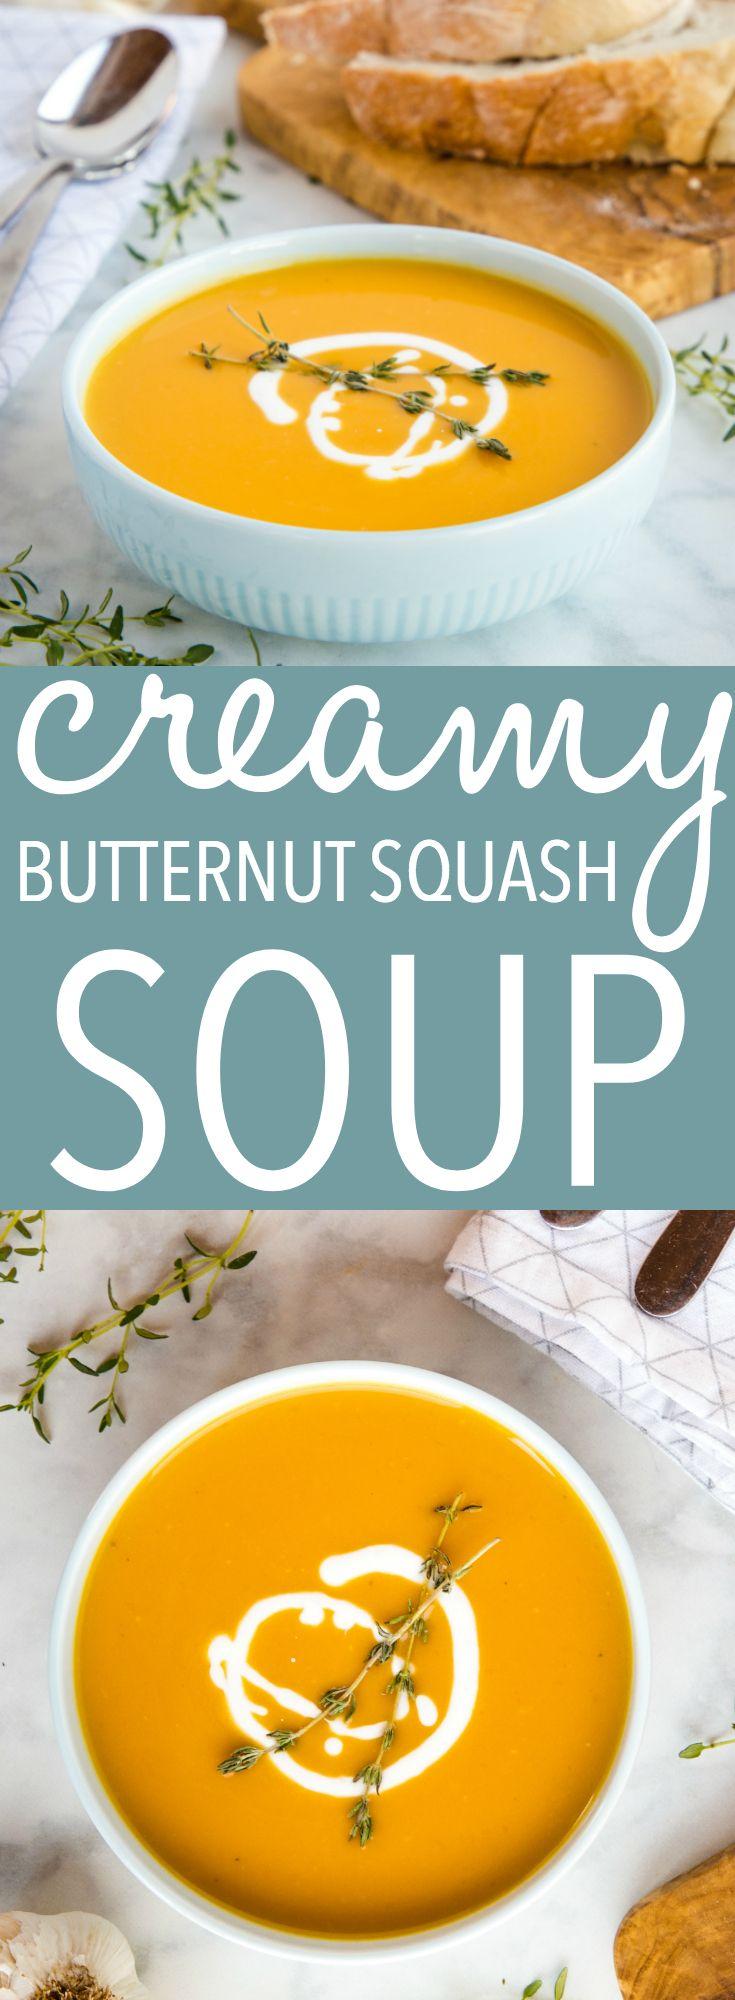 Creamy One Pot Butternut Squash Soup